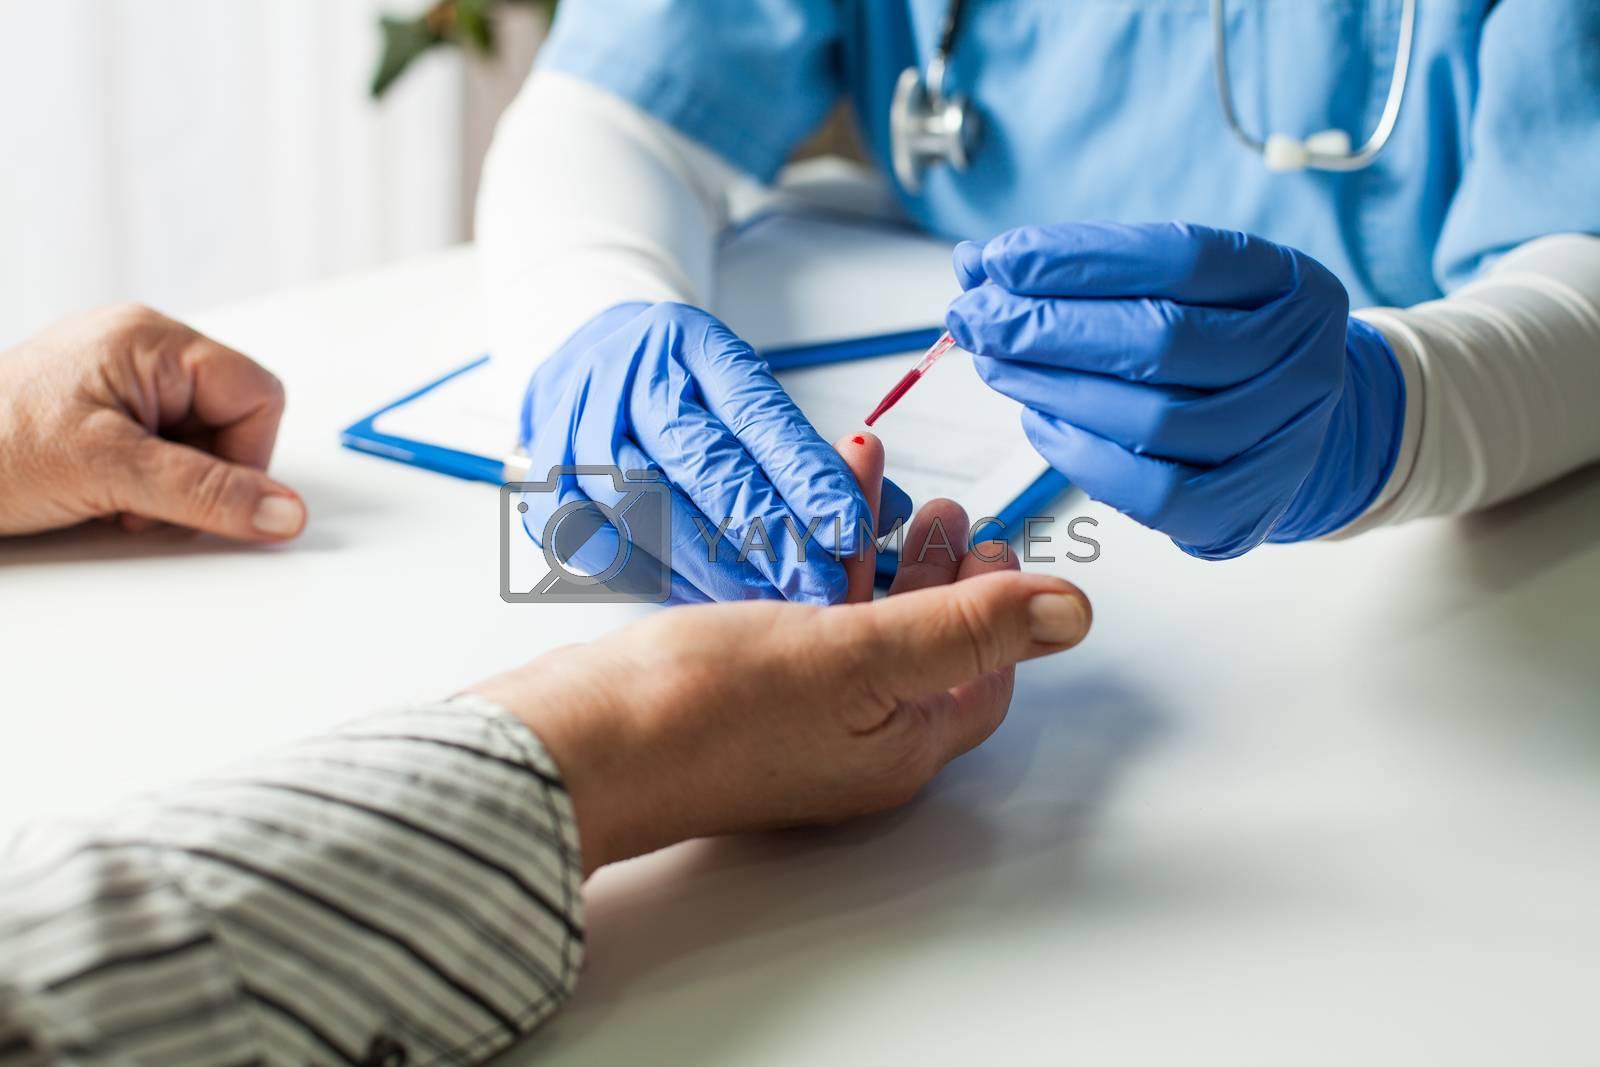 NHS UK doctor taking patient blood sample,serologic finger prick PRP blood antibodies test to determine whether person developed immunity to novel Coronavirus,global COVID-19 pandemic health crisis